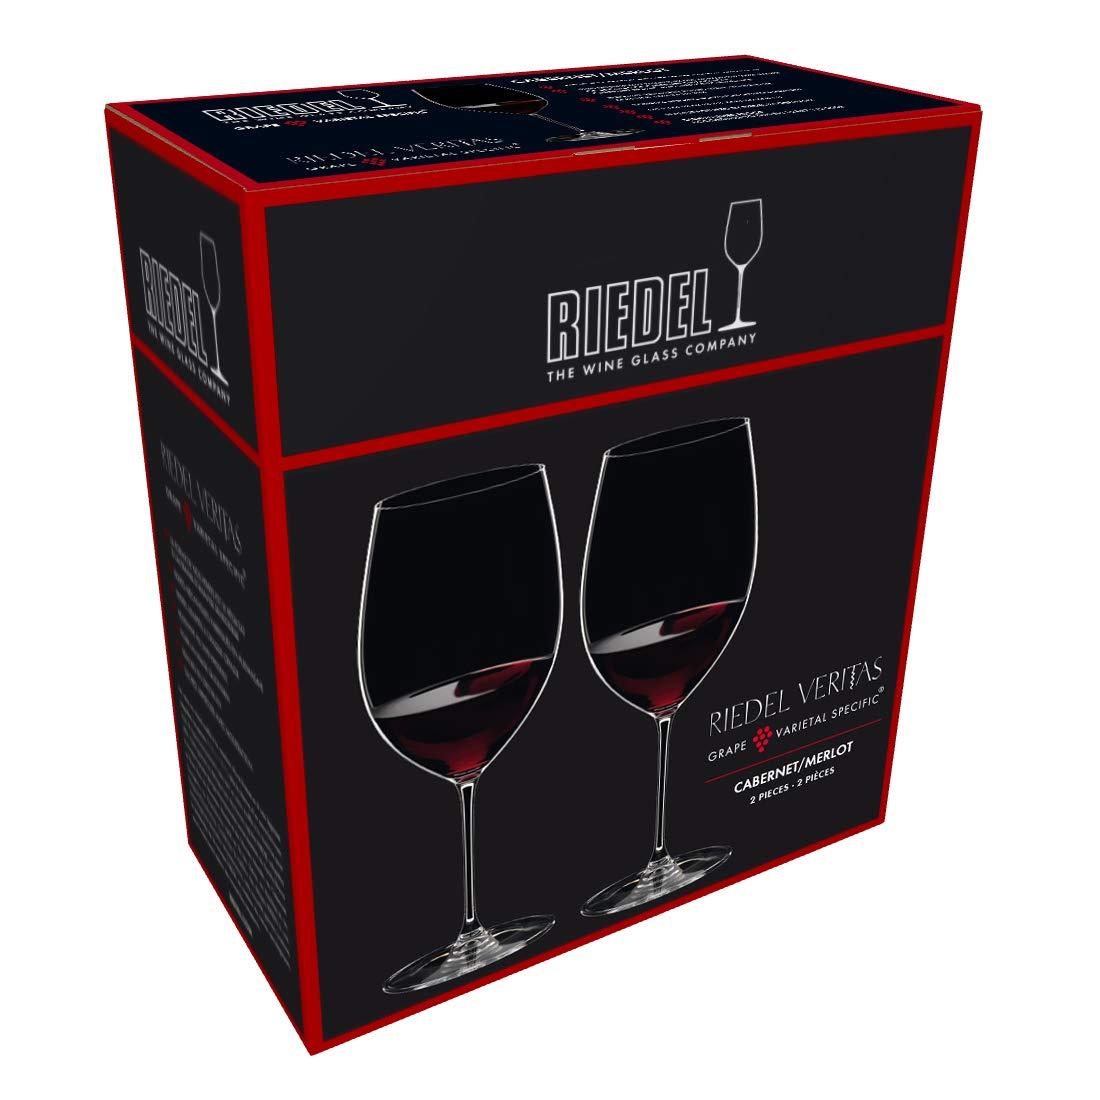 Riedel 6449/0 Veritas Cabernet/Merlot Wine Glasses, Set of 2, Clear by Riedel (Image #3)